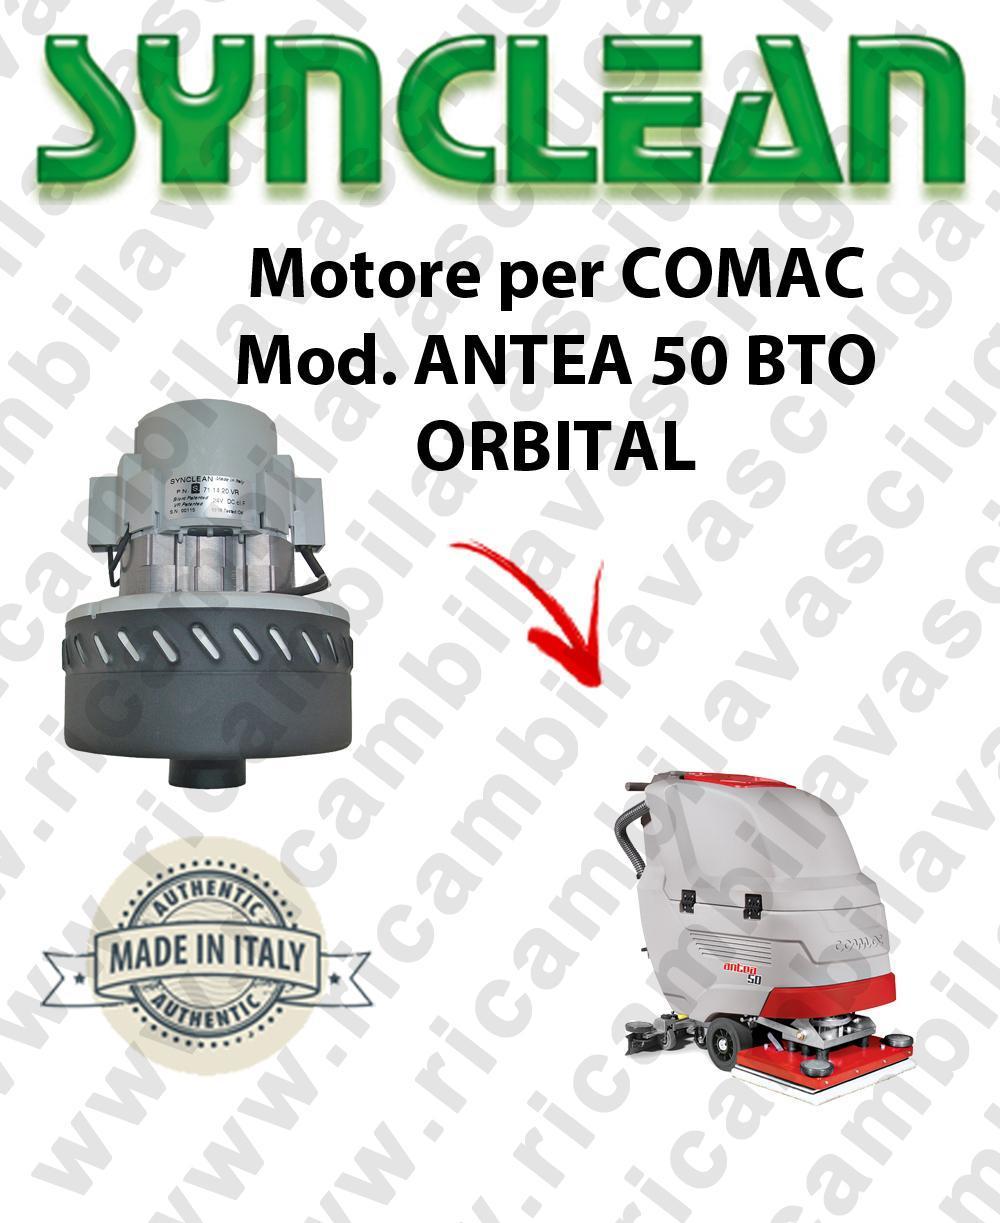 ANTEA 50 BTO ORBITAL Vacuum motor SYNCLEAN for scrubber dryer COMAC